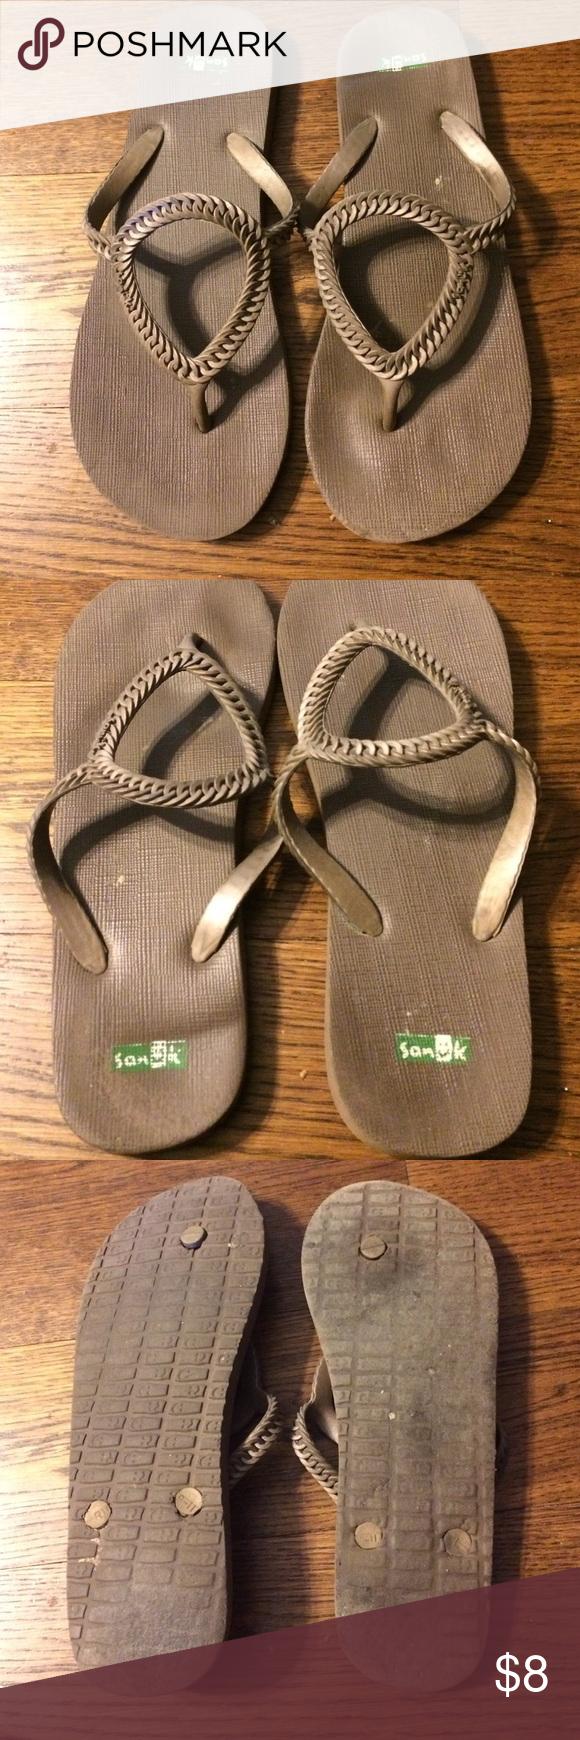 Brown Tan Sanuk Sandals Brown/tan colored Sanuk sandals. Size 9-11. But they fit like a true size 10. Sanuk Shoes Sandals